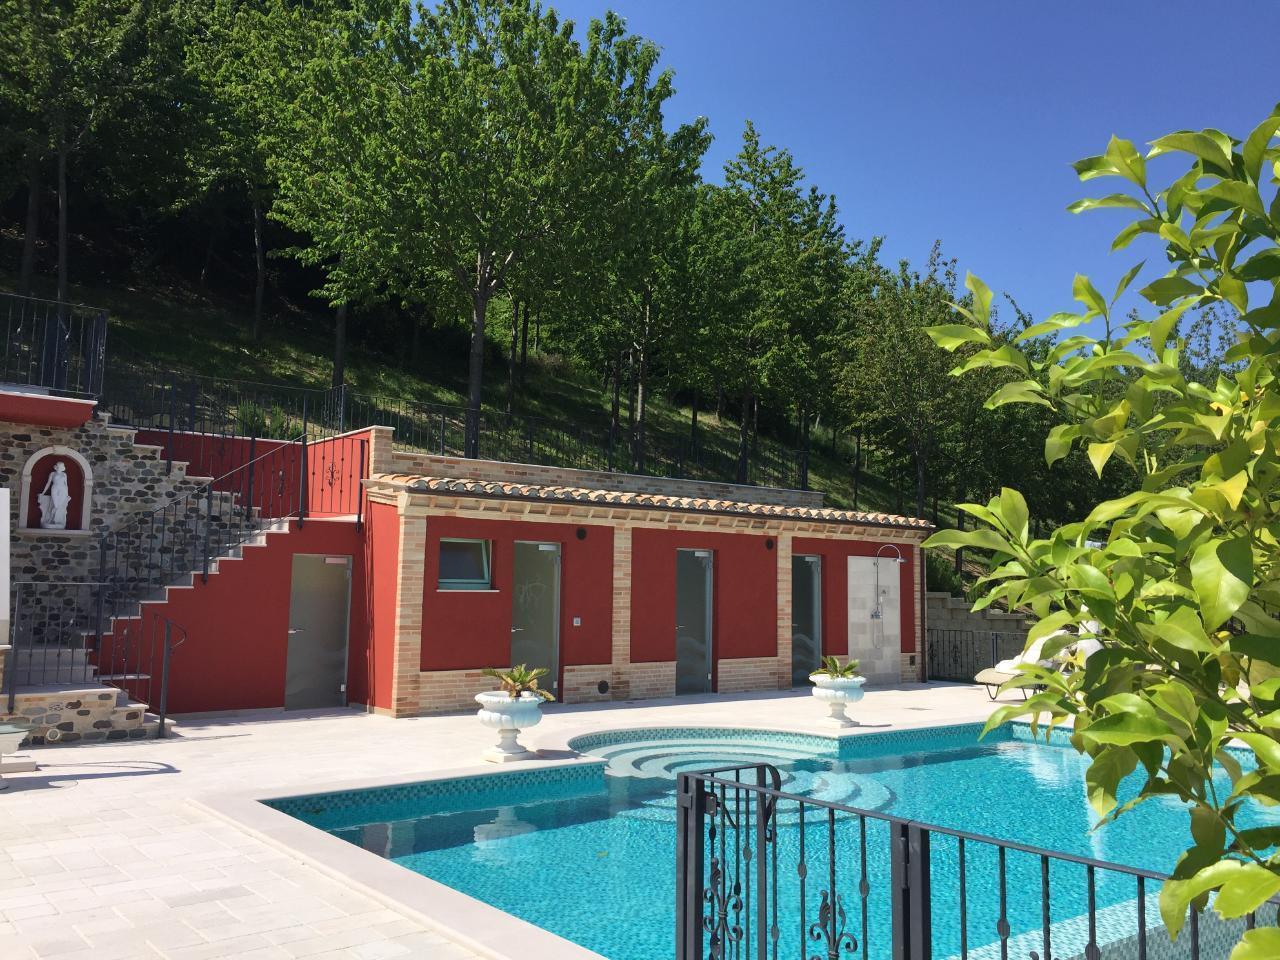 Ferienhaus Casa Sacciofa (461889), Monte Rinaldo, Fermo, Marken, Italien, Bild 4